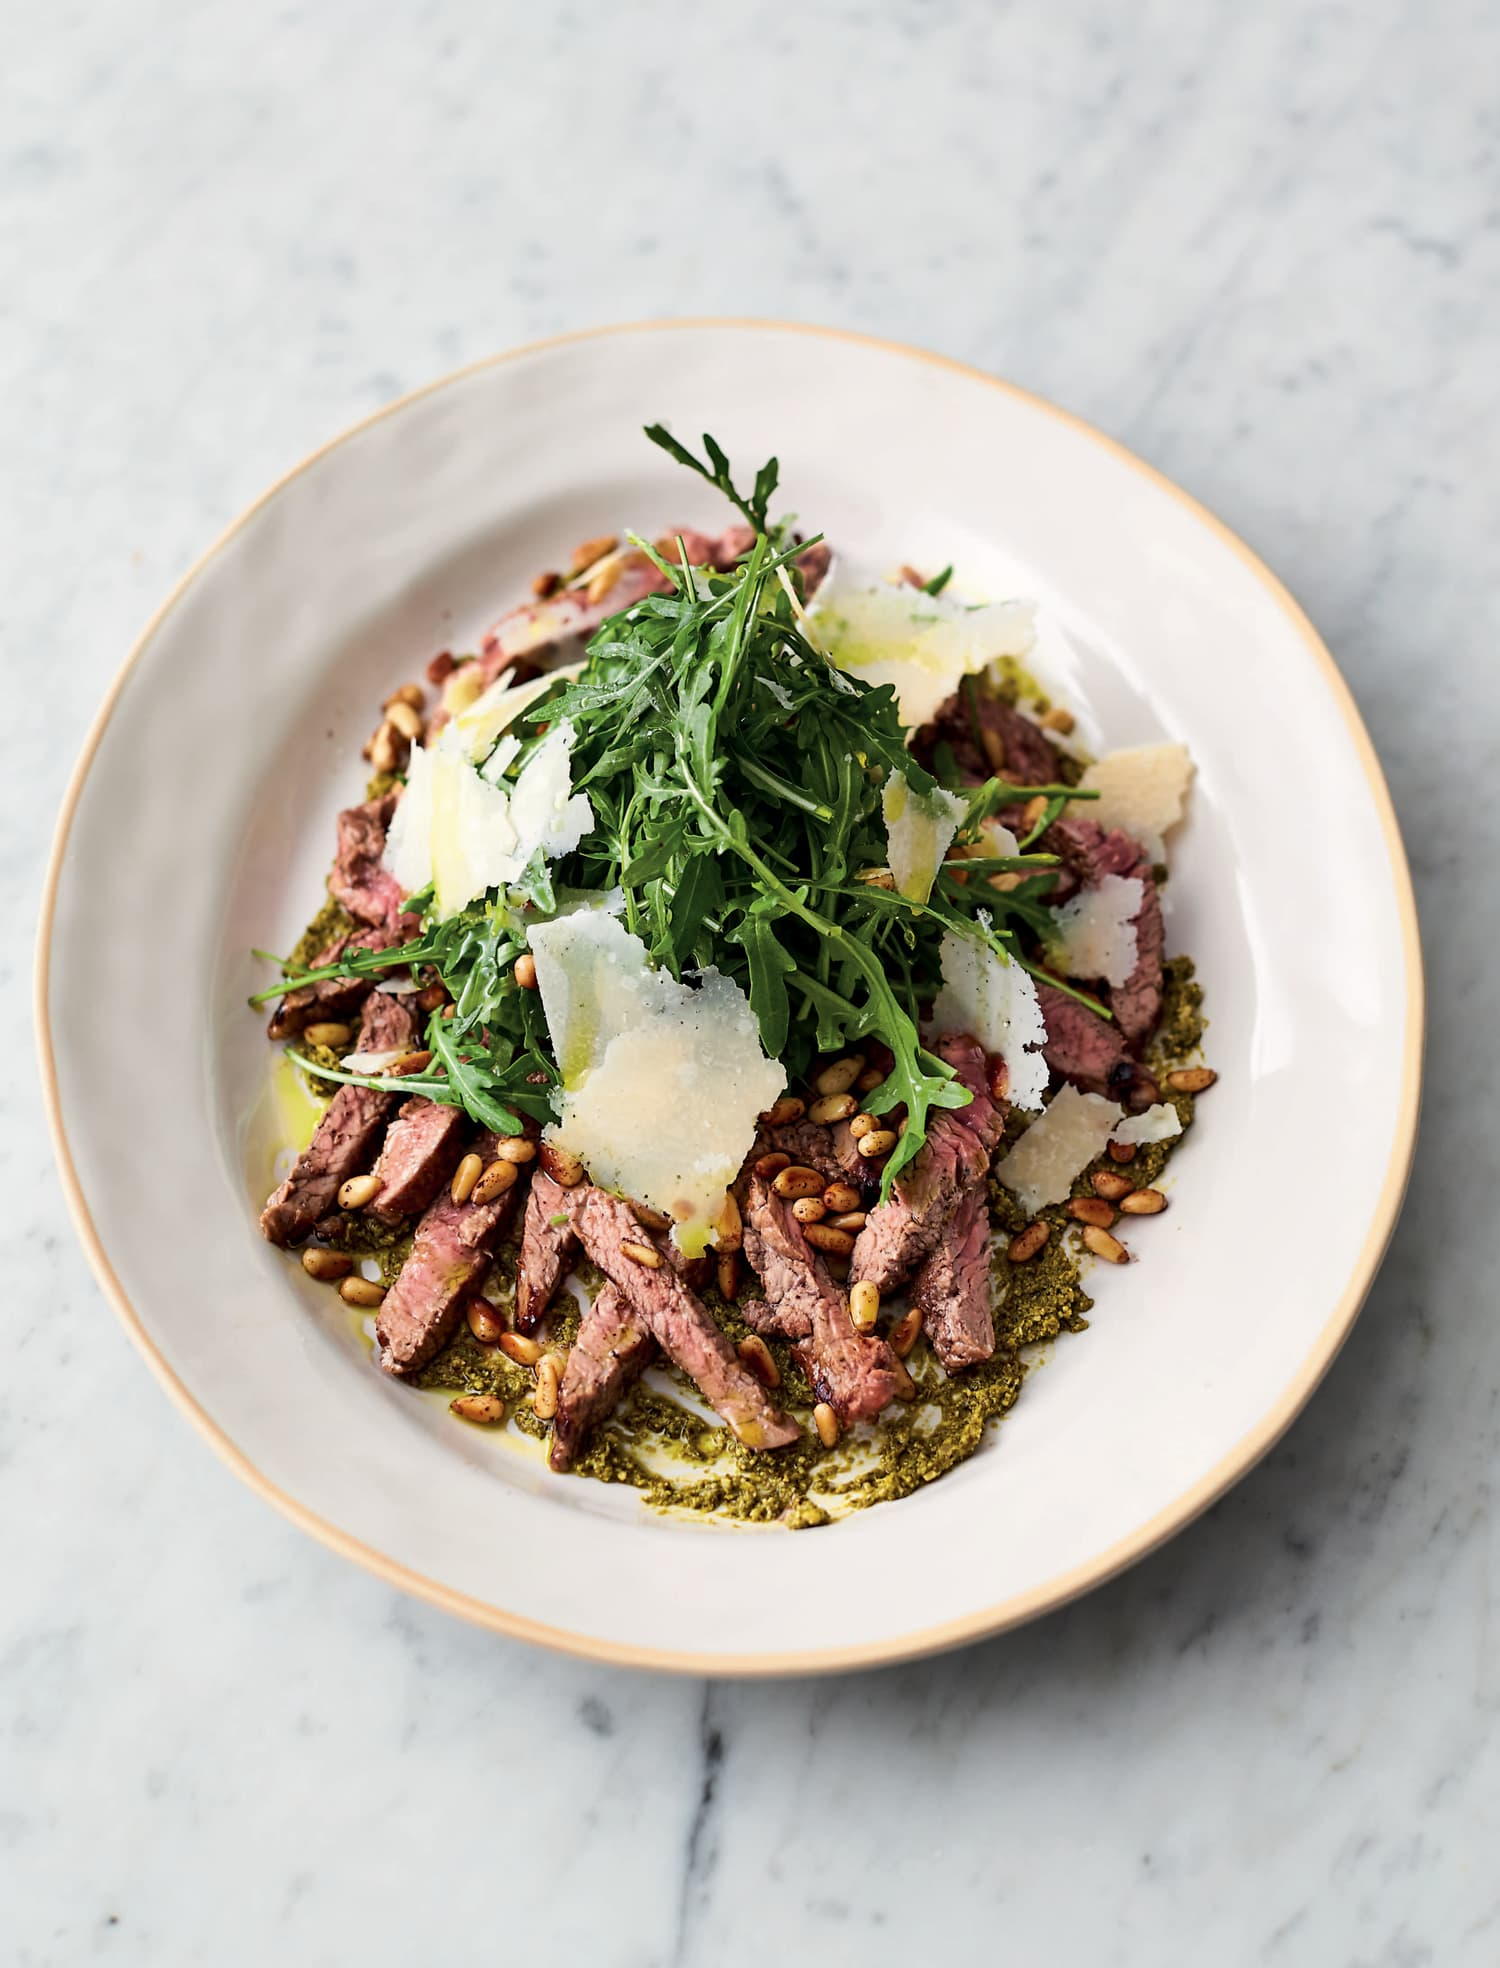 Jamie Oliver's 5-Ingredient Italian Seared Beef